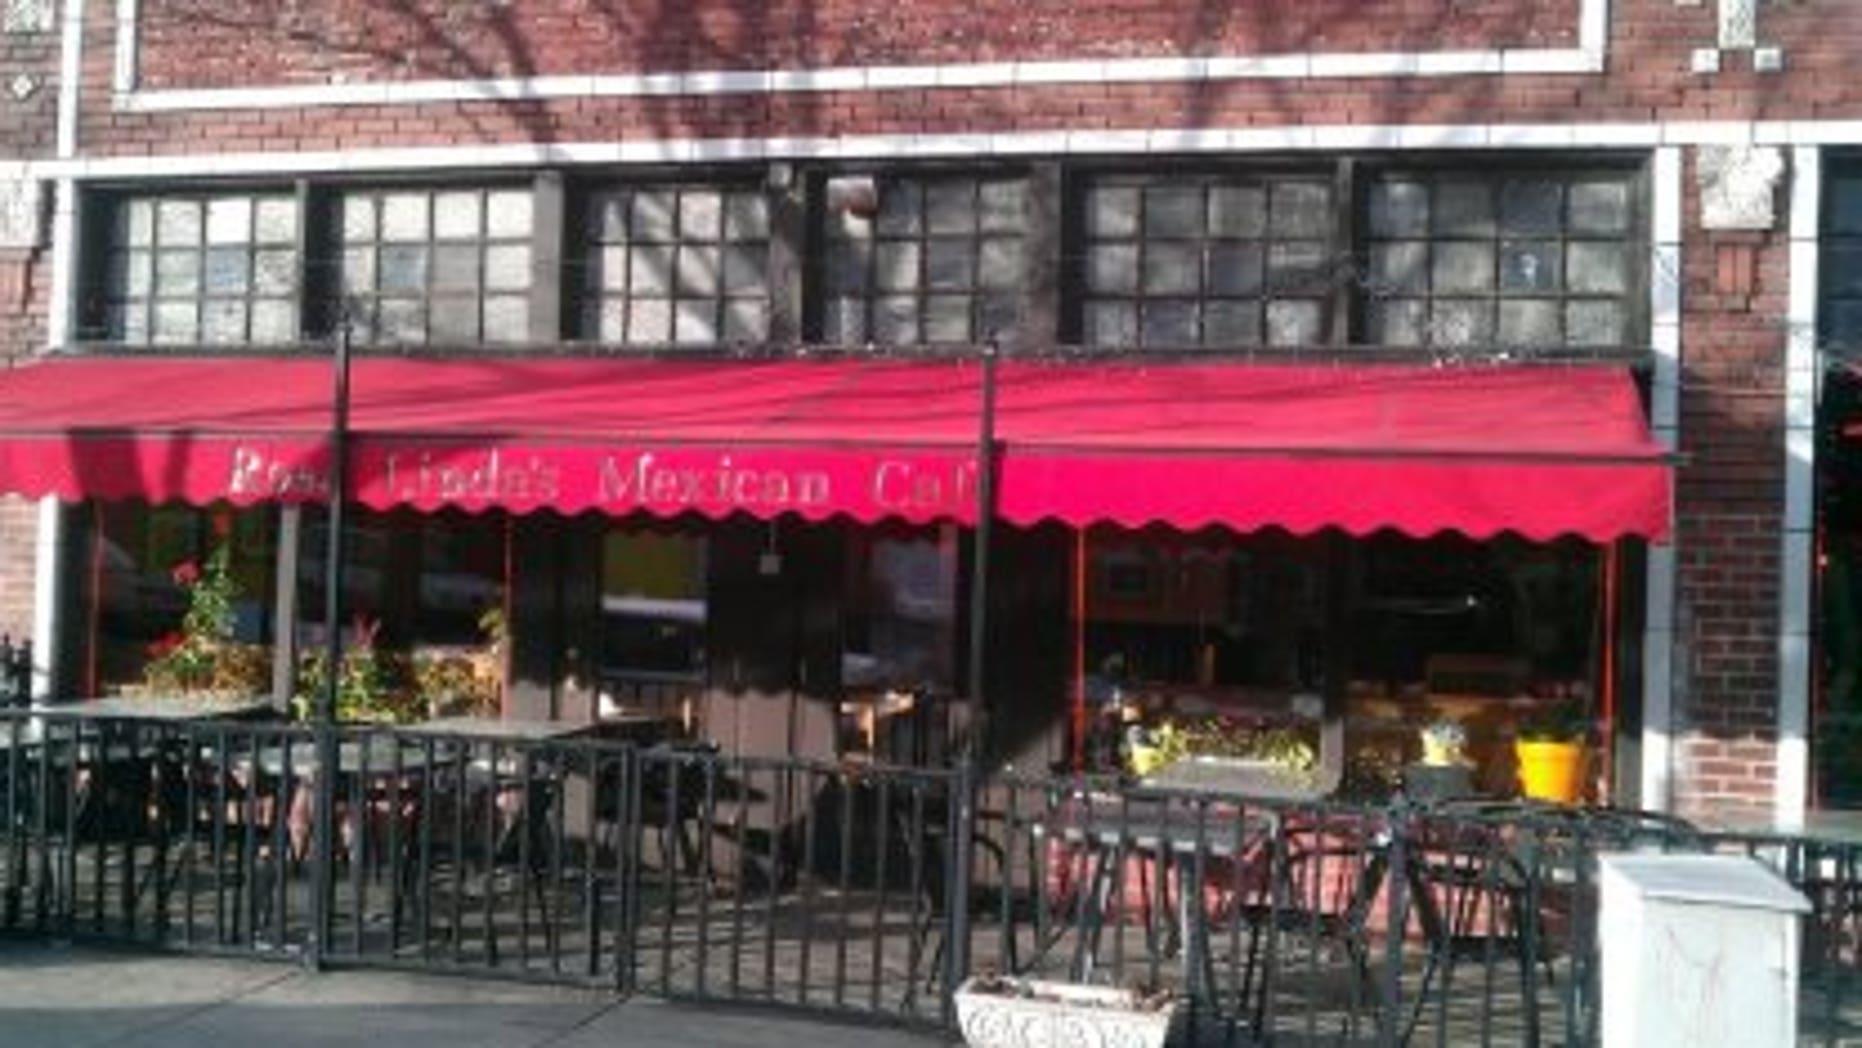 Rosa Linda's Mexican Cafe in Denver.